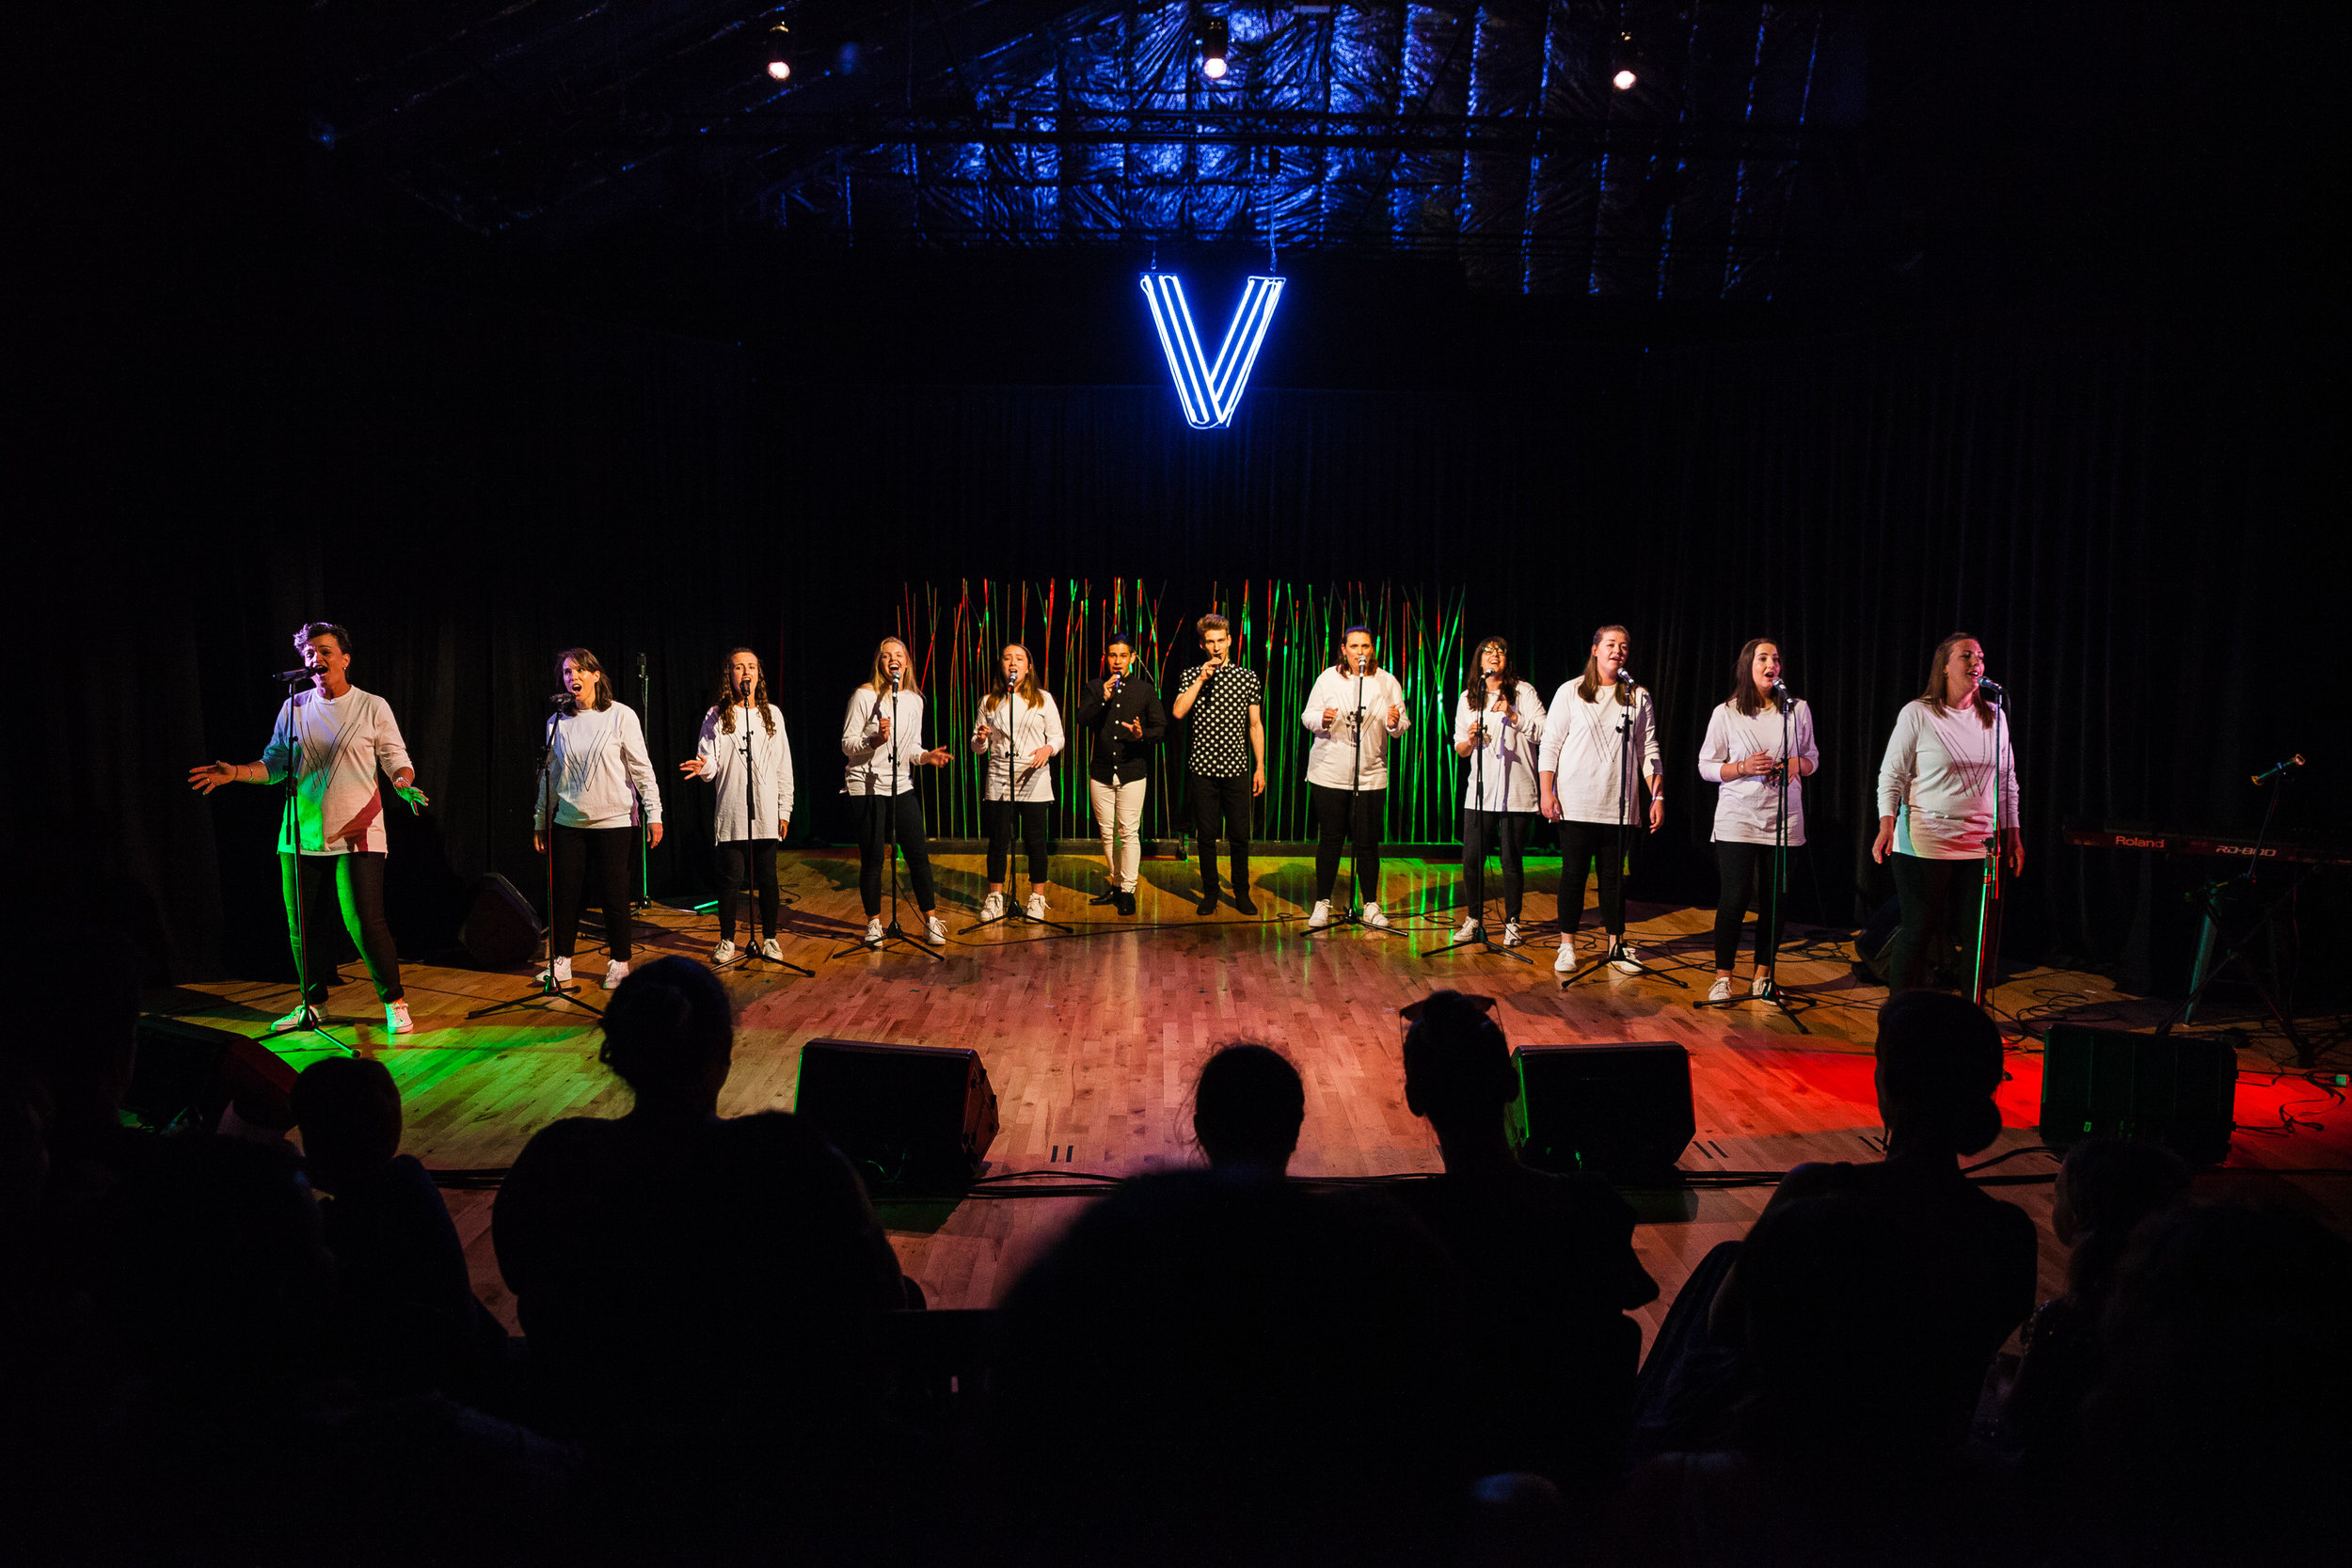 Voices Co - Show (172).jpg